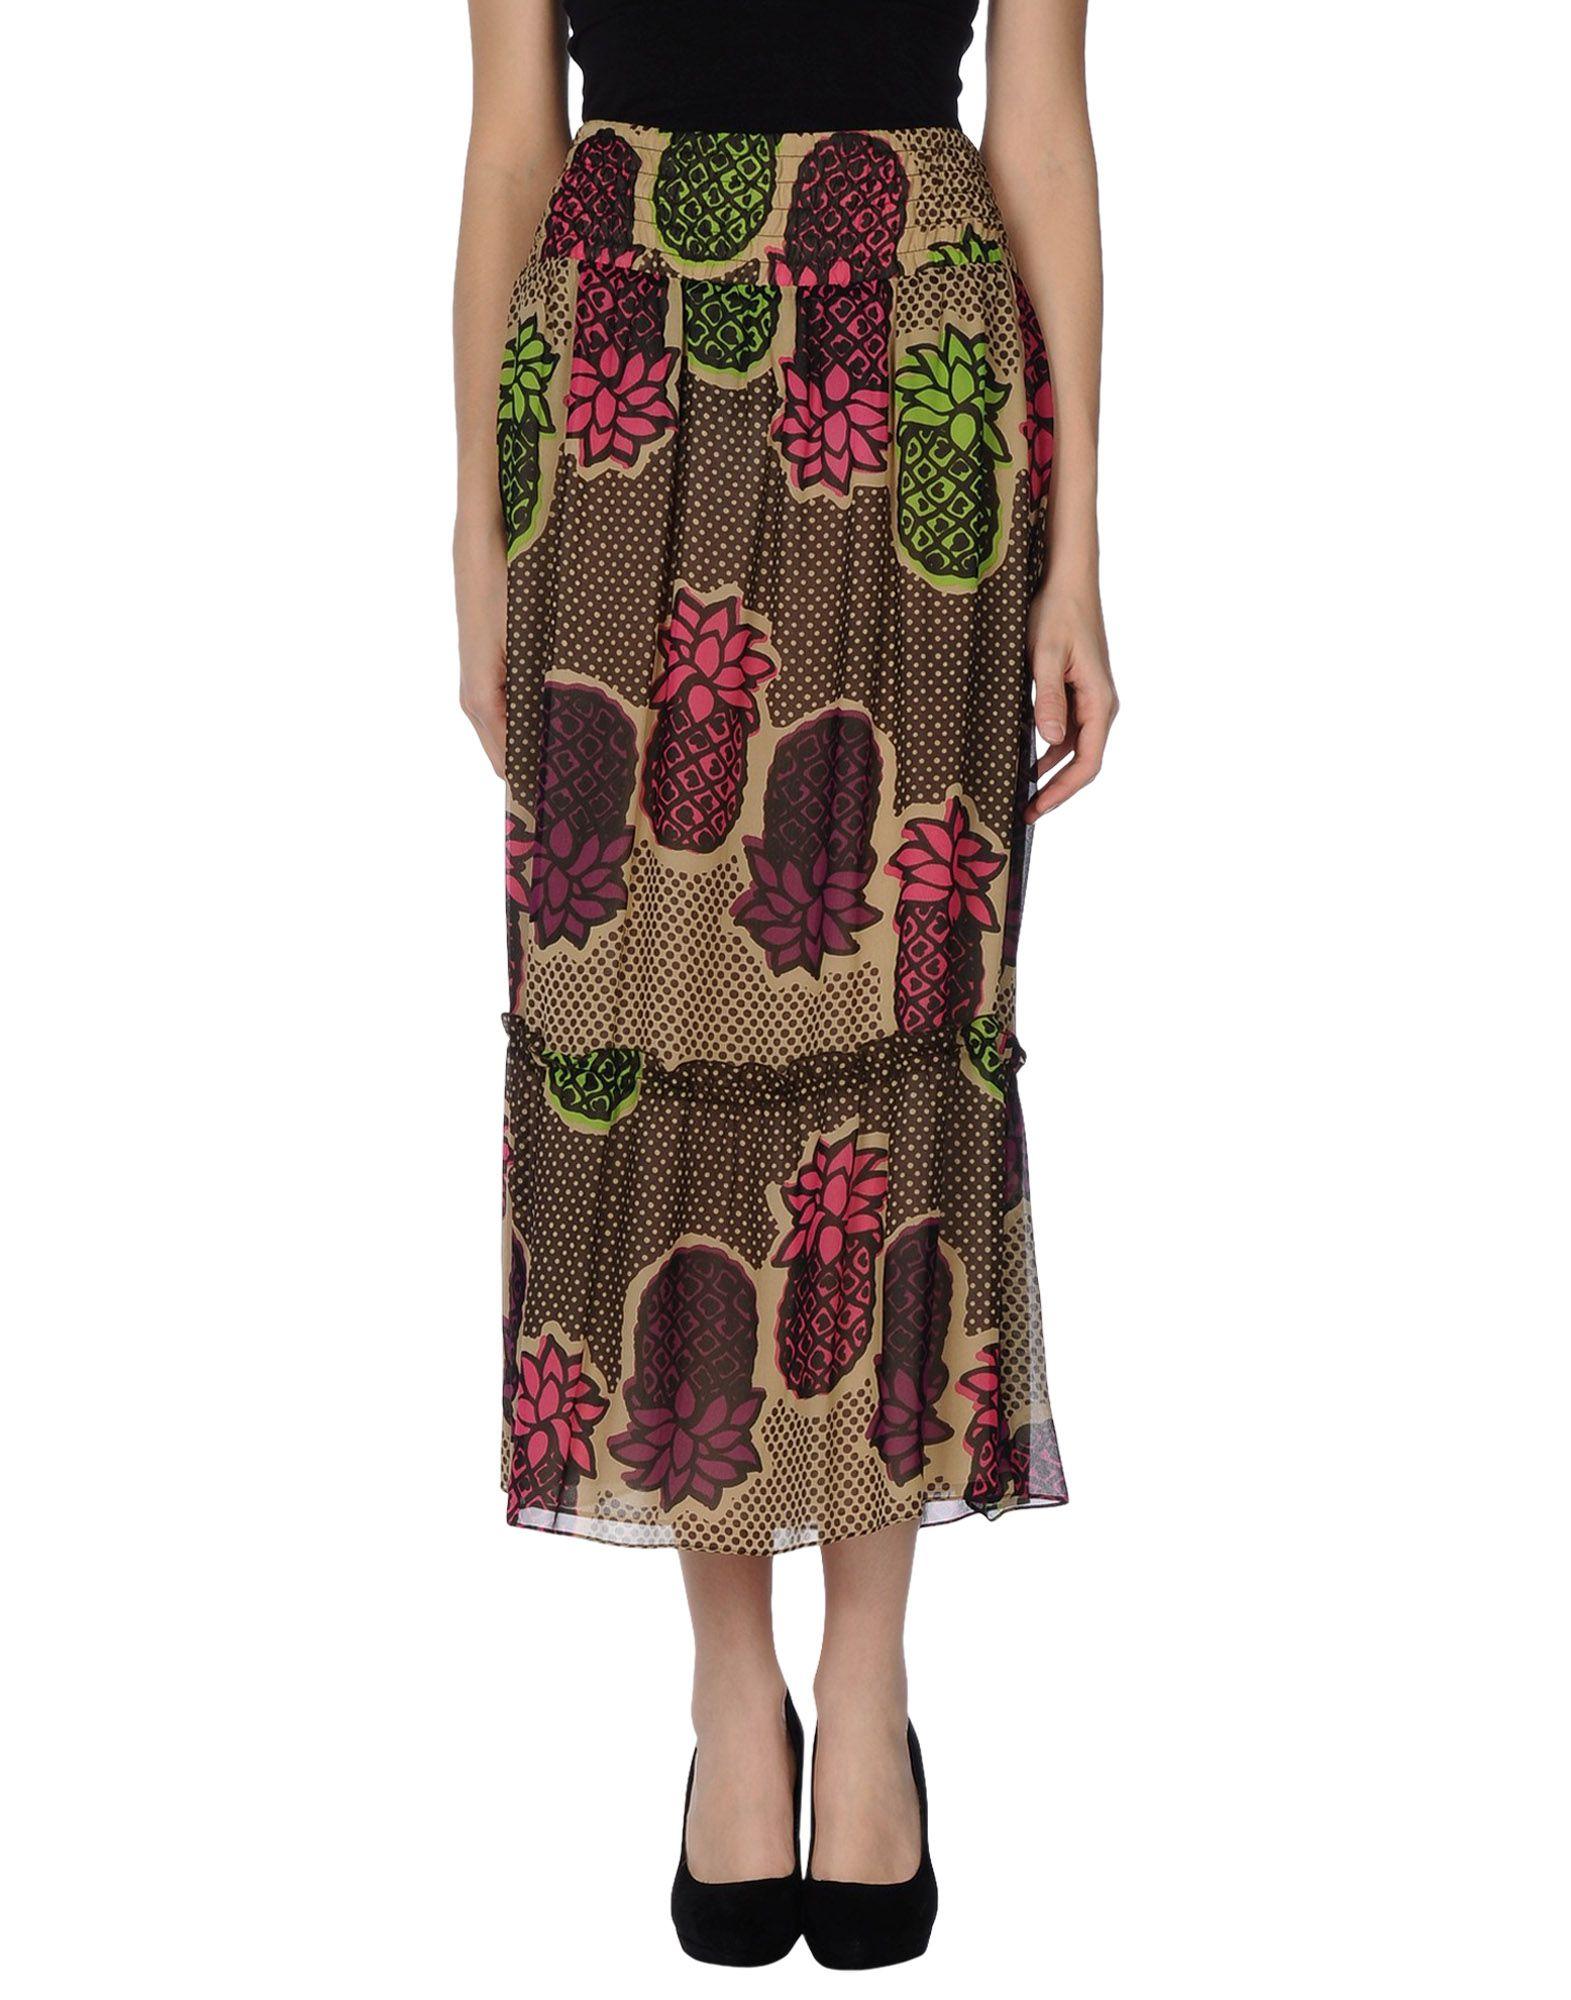 MOSCHINO CHEAP AND CHIC Юбка длиной 3/4 moschino couture юбка длиной 3 4